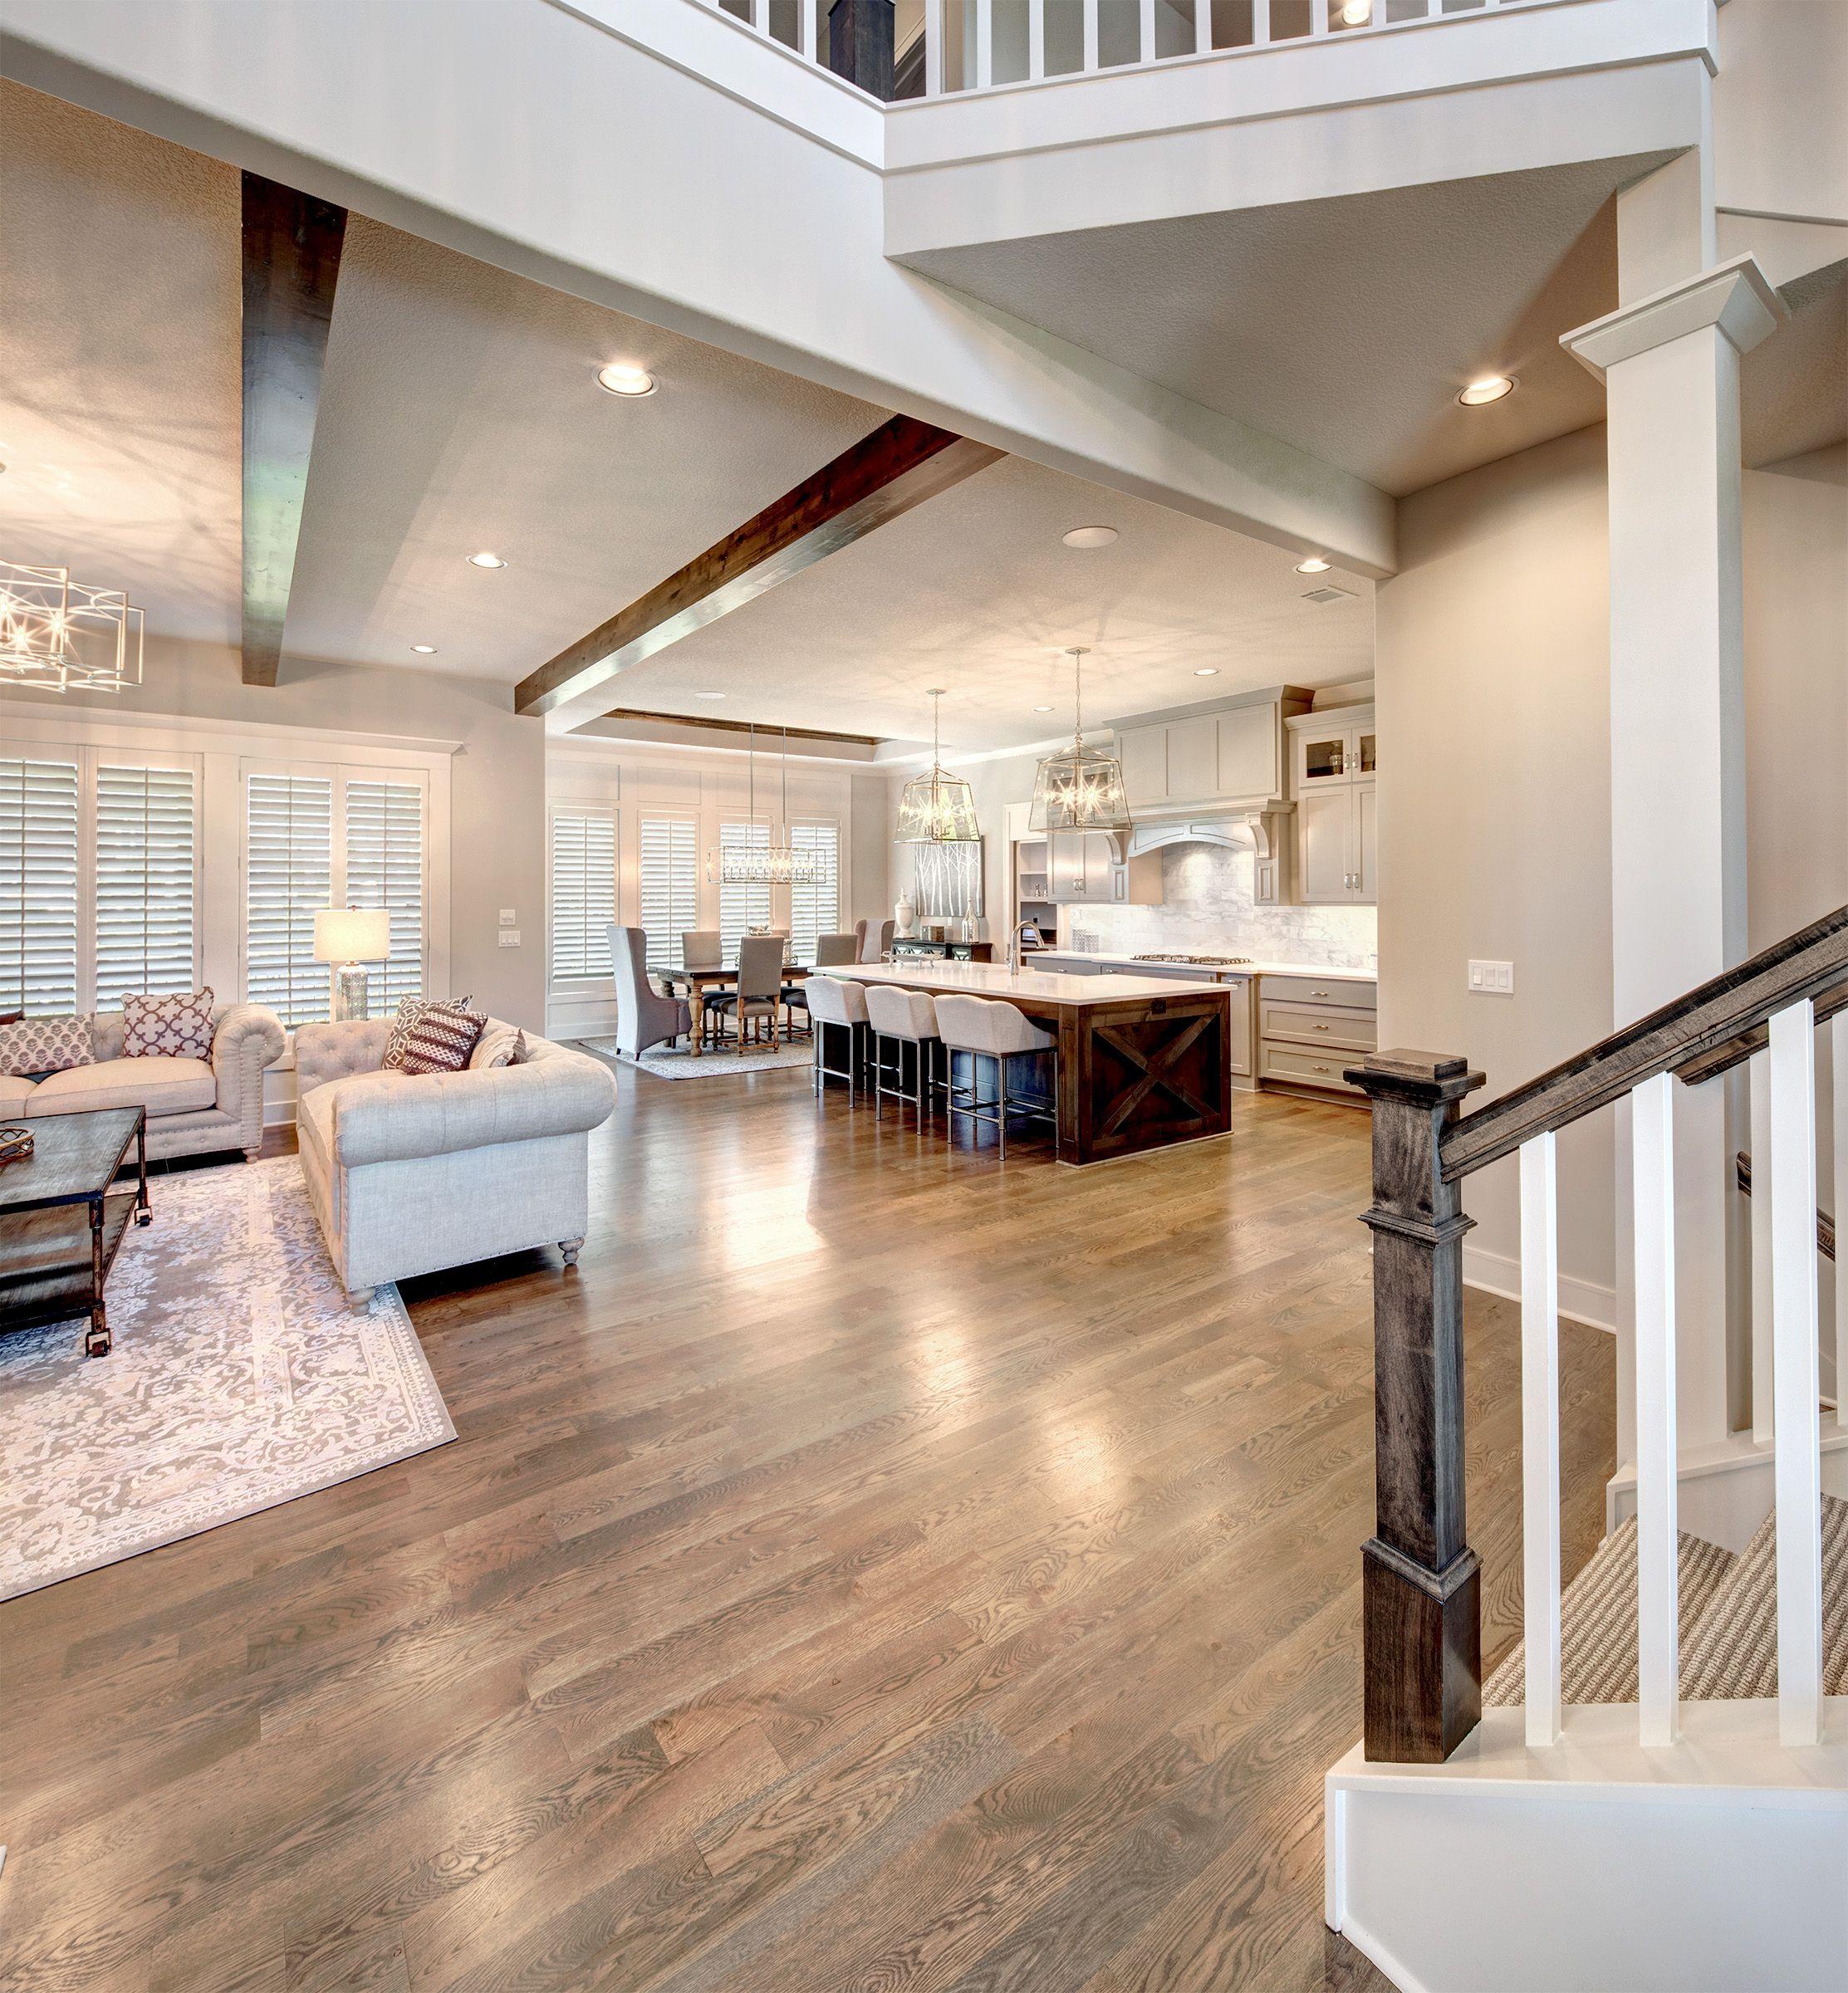 I Model Home Gallery Johnson County Ks New Home Builders New